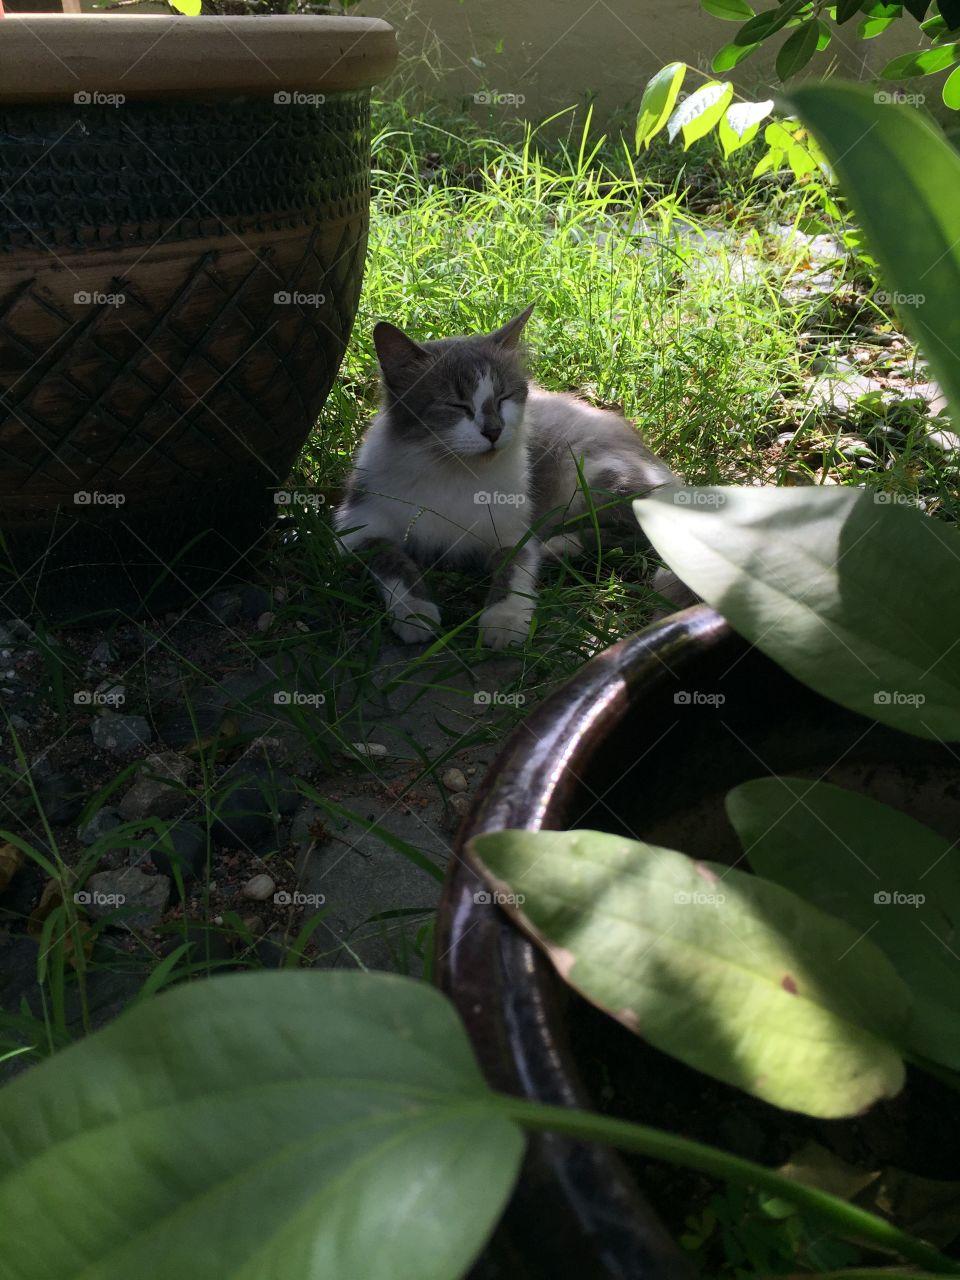 Cat enjoying comfortable shade. Best of cat